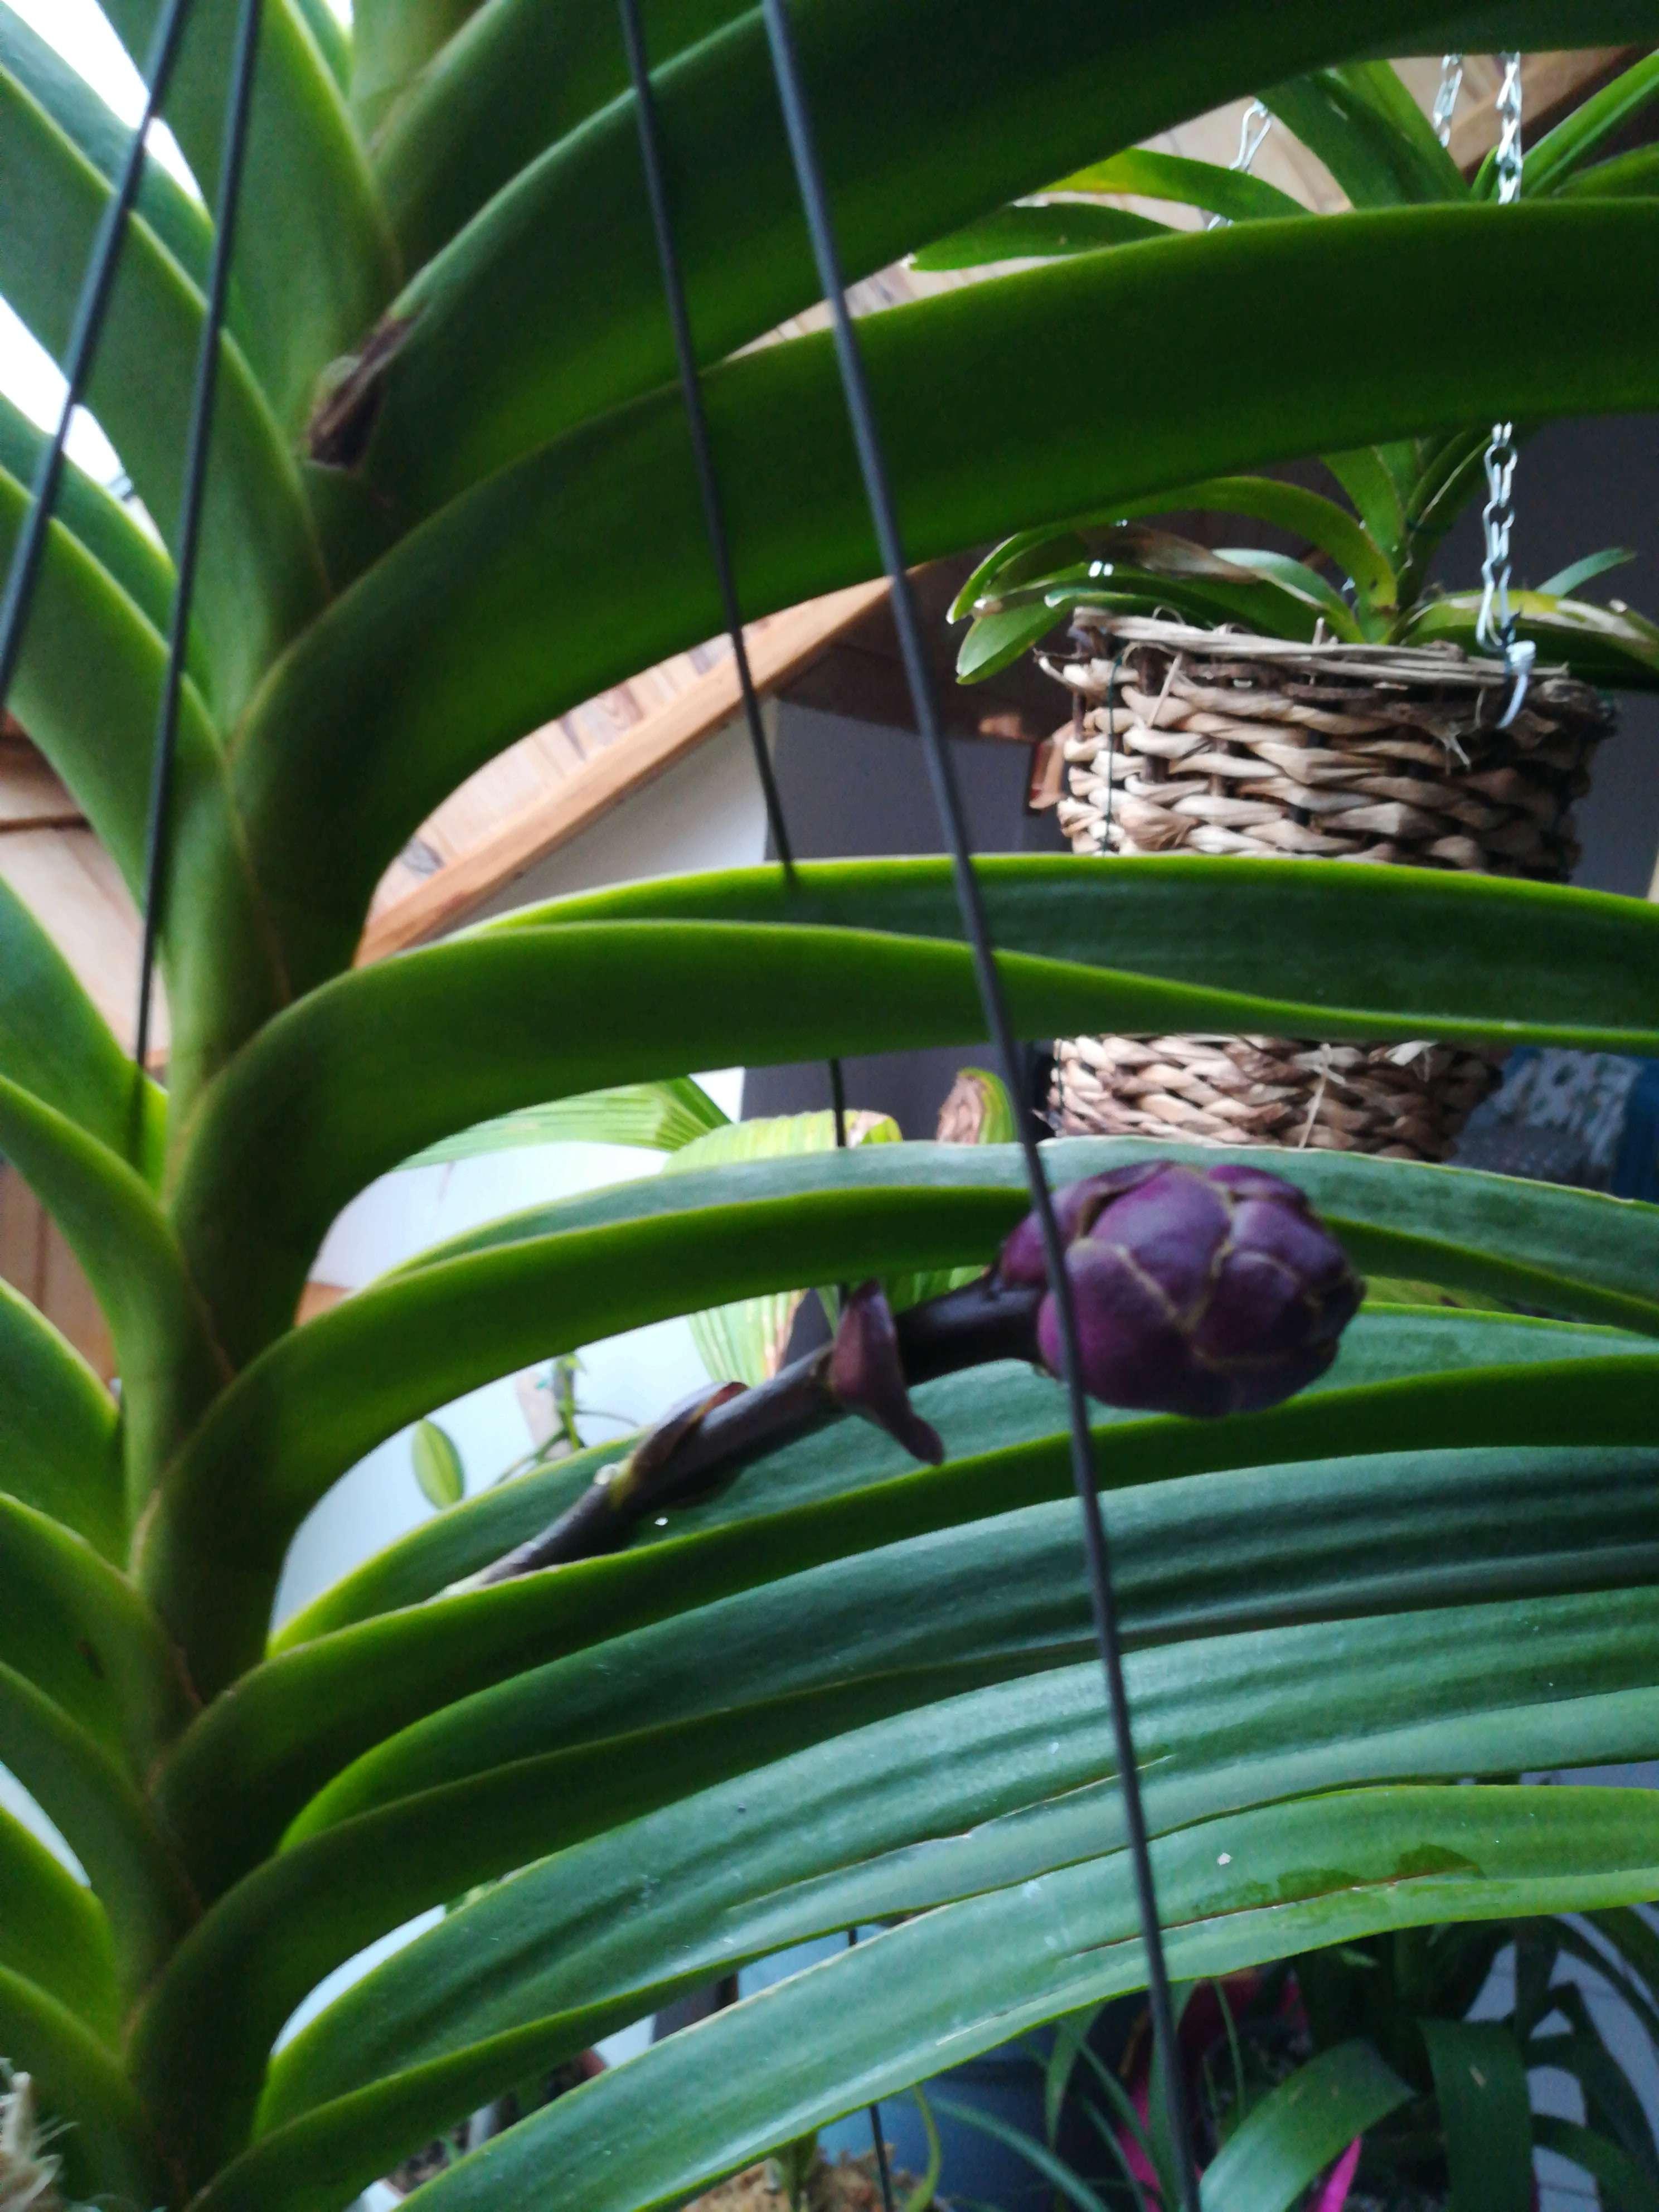 Vanda Rhv.Thailland x mimi palmer 15275712